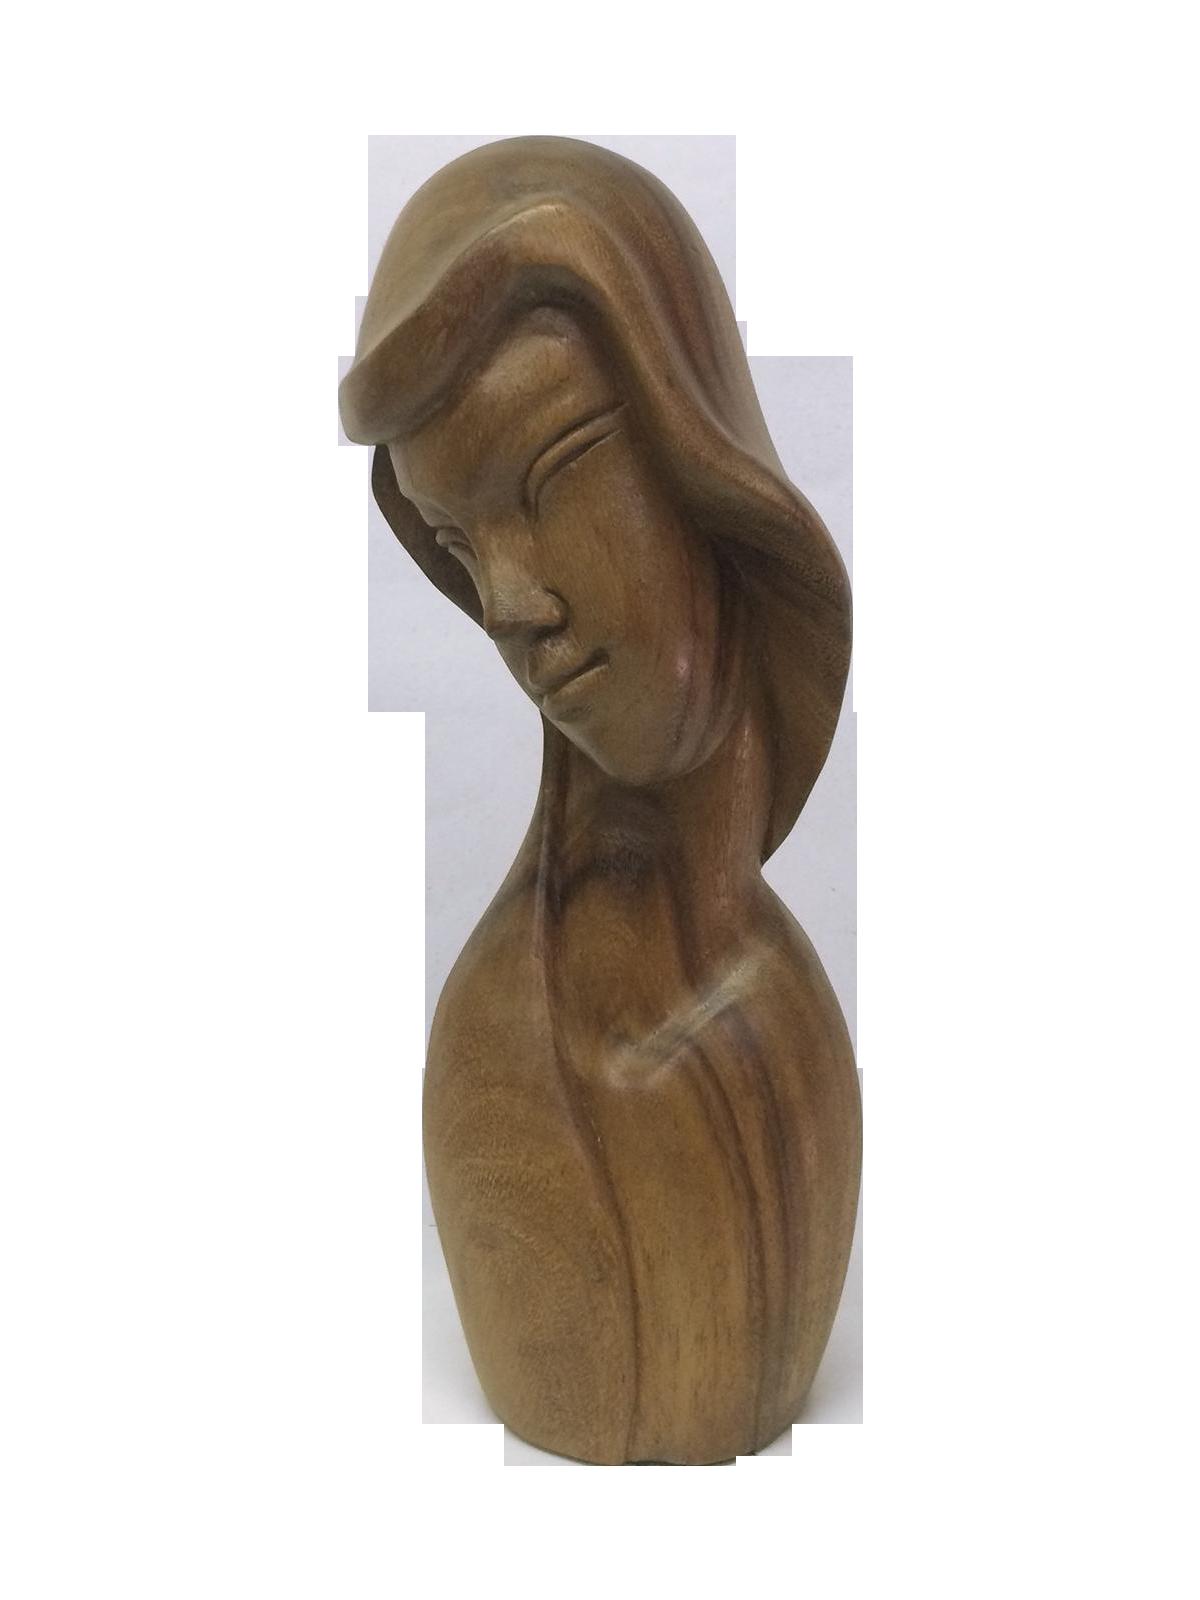 Carved female bust in dark wood chairish